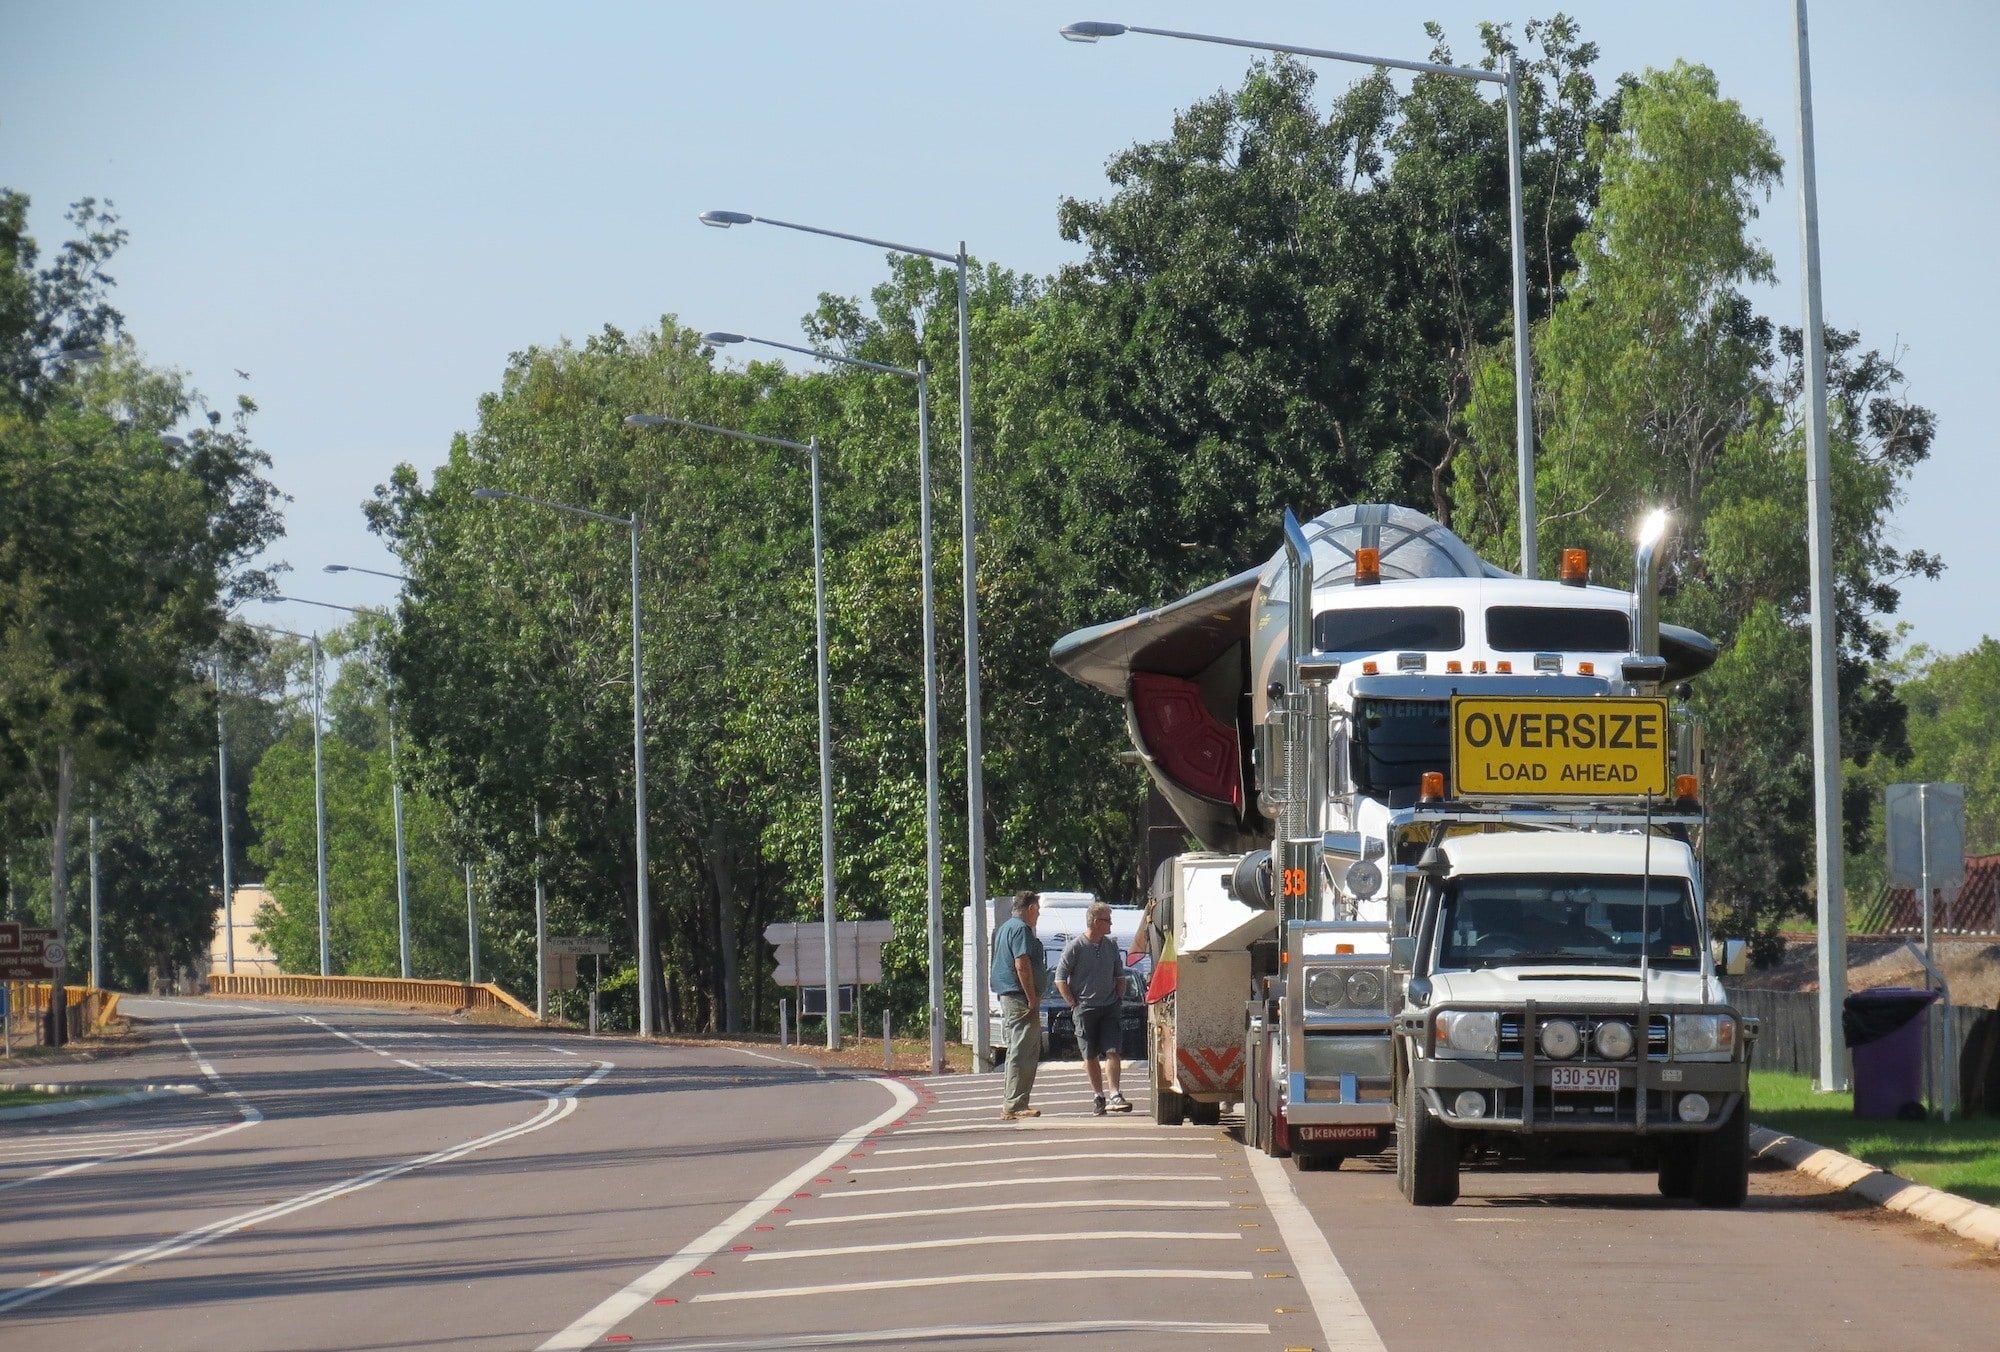 Oversized Vehicle Transport by Ken Hodge